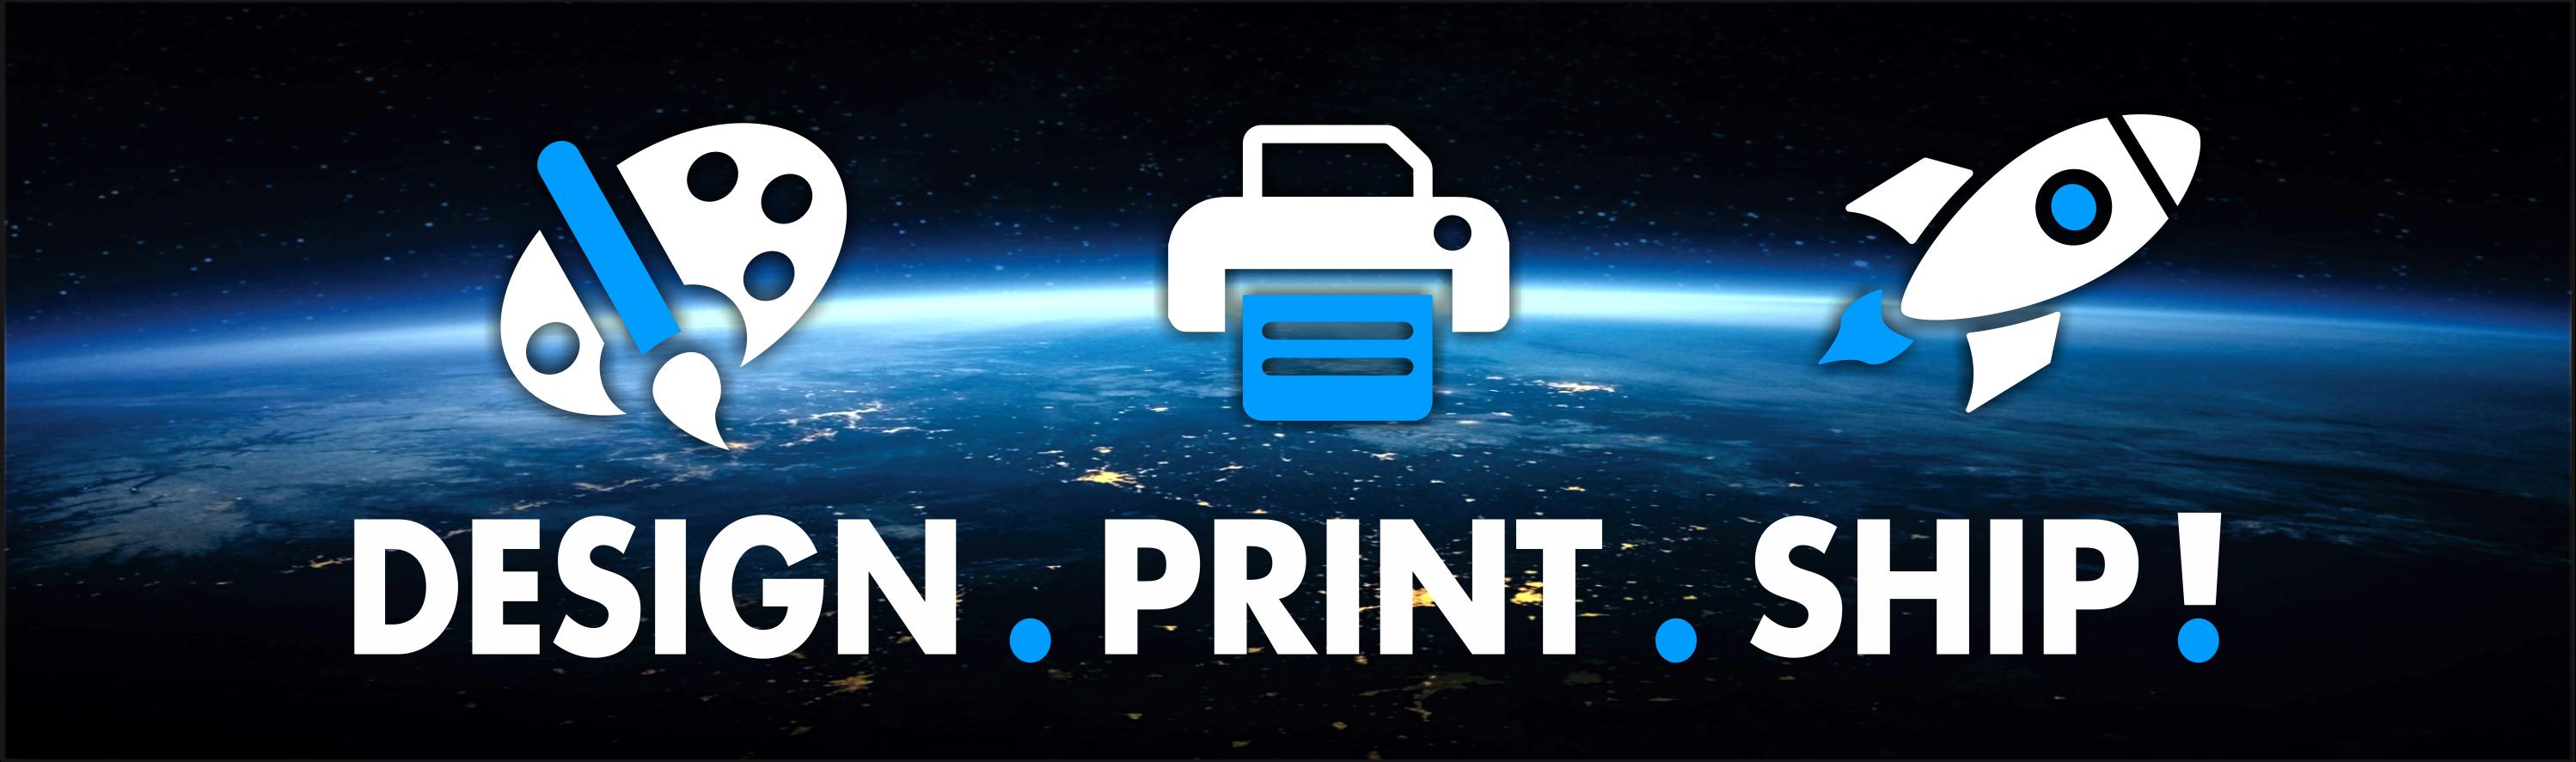 design print ship